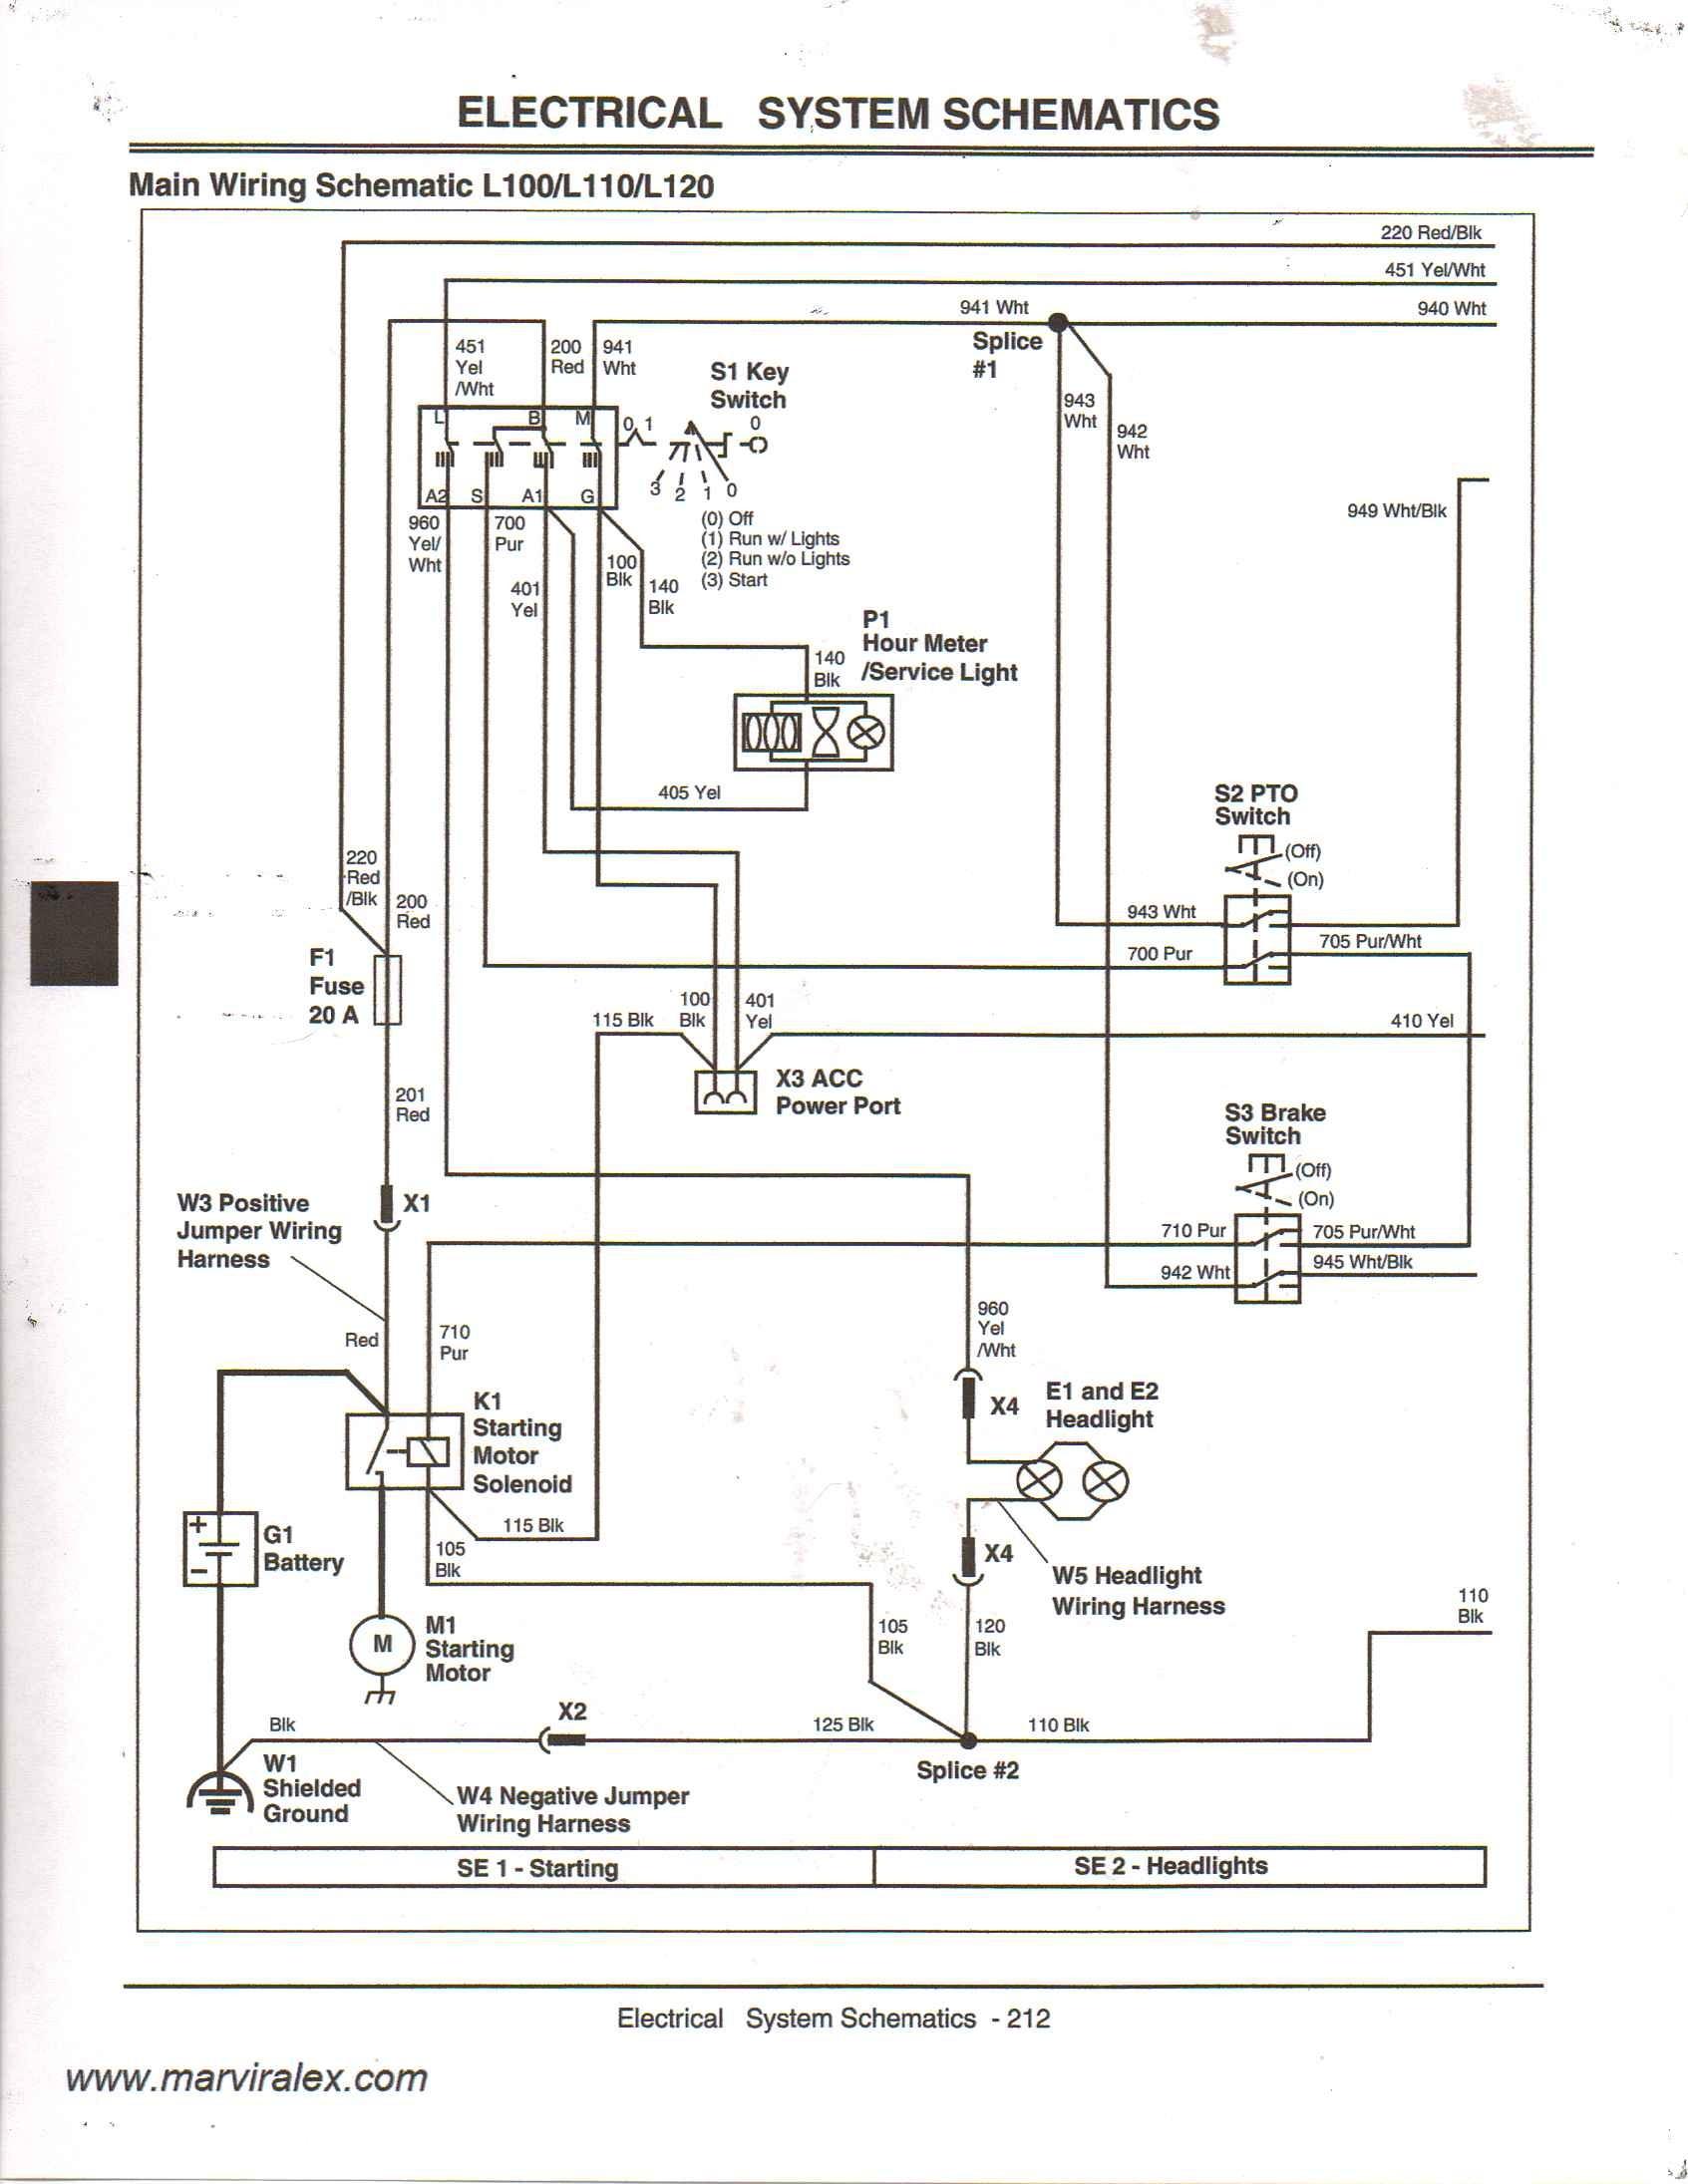 John Deere 318 Wiring Diagram Pdf Cb 4290] for John Deere 1050 Tractor Wiring Diagram